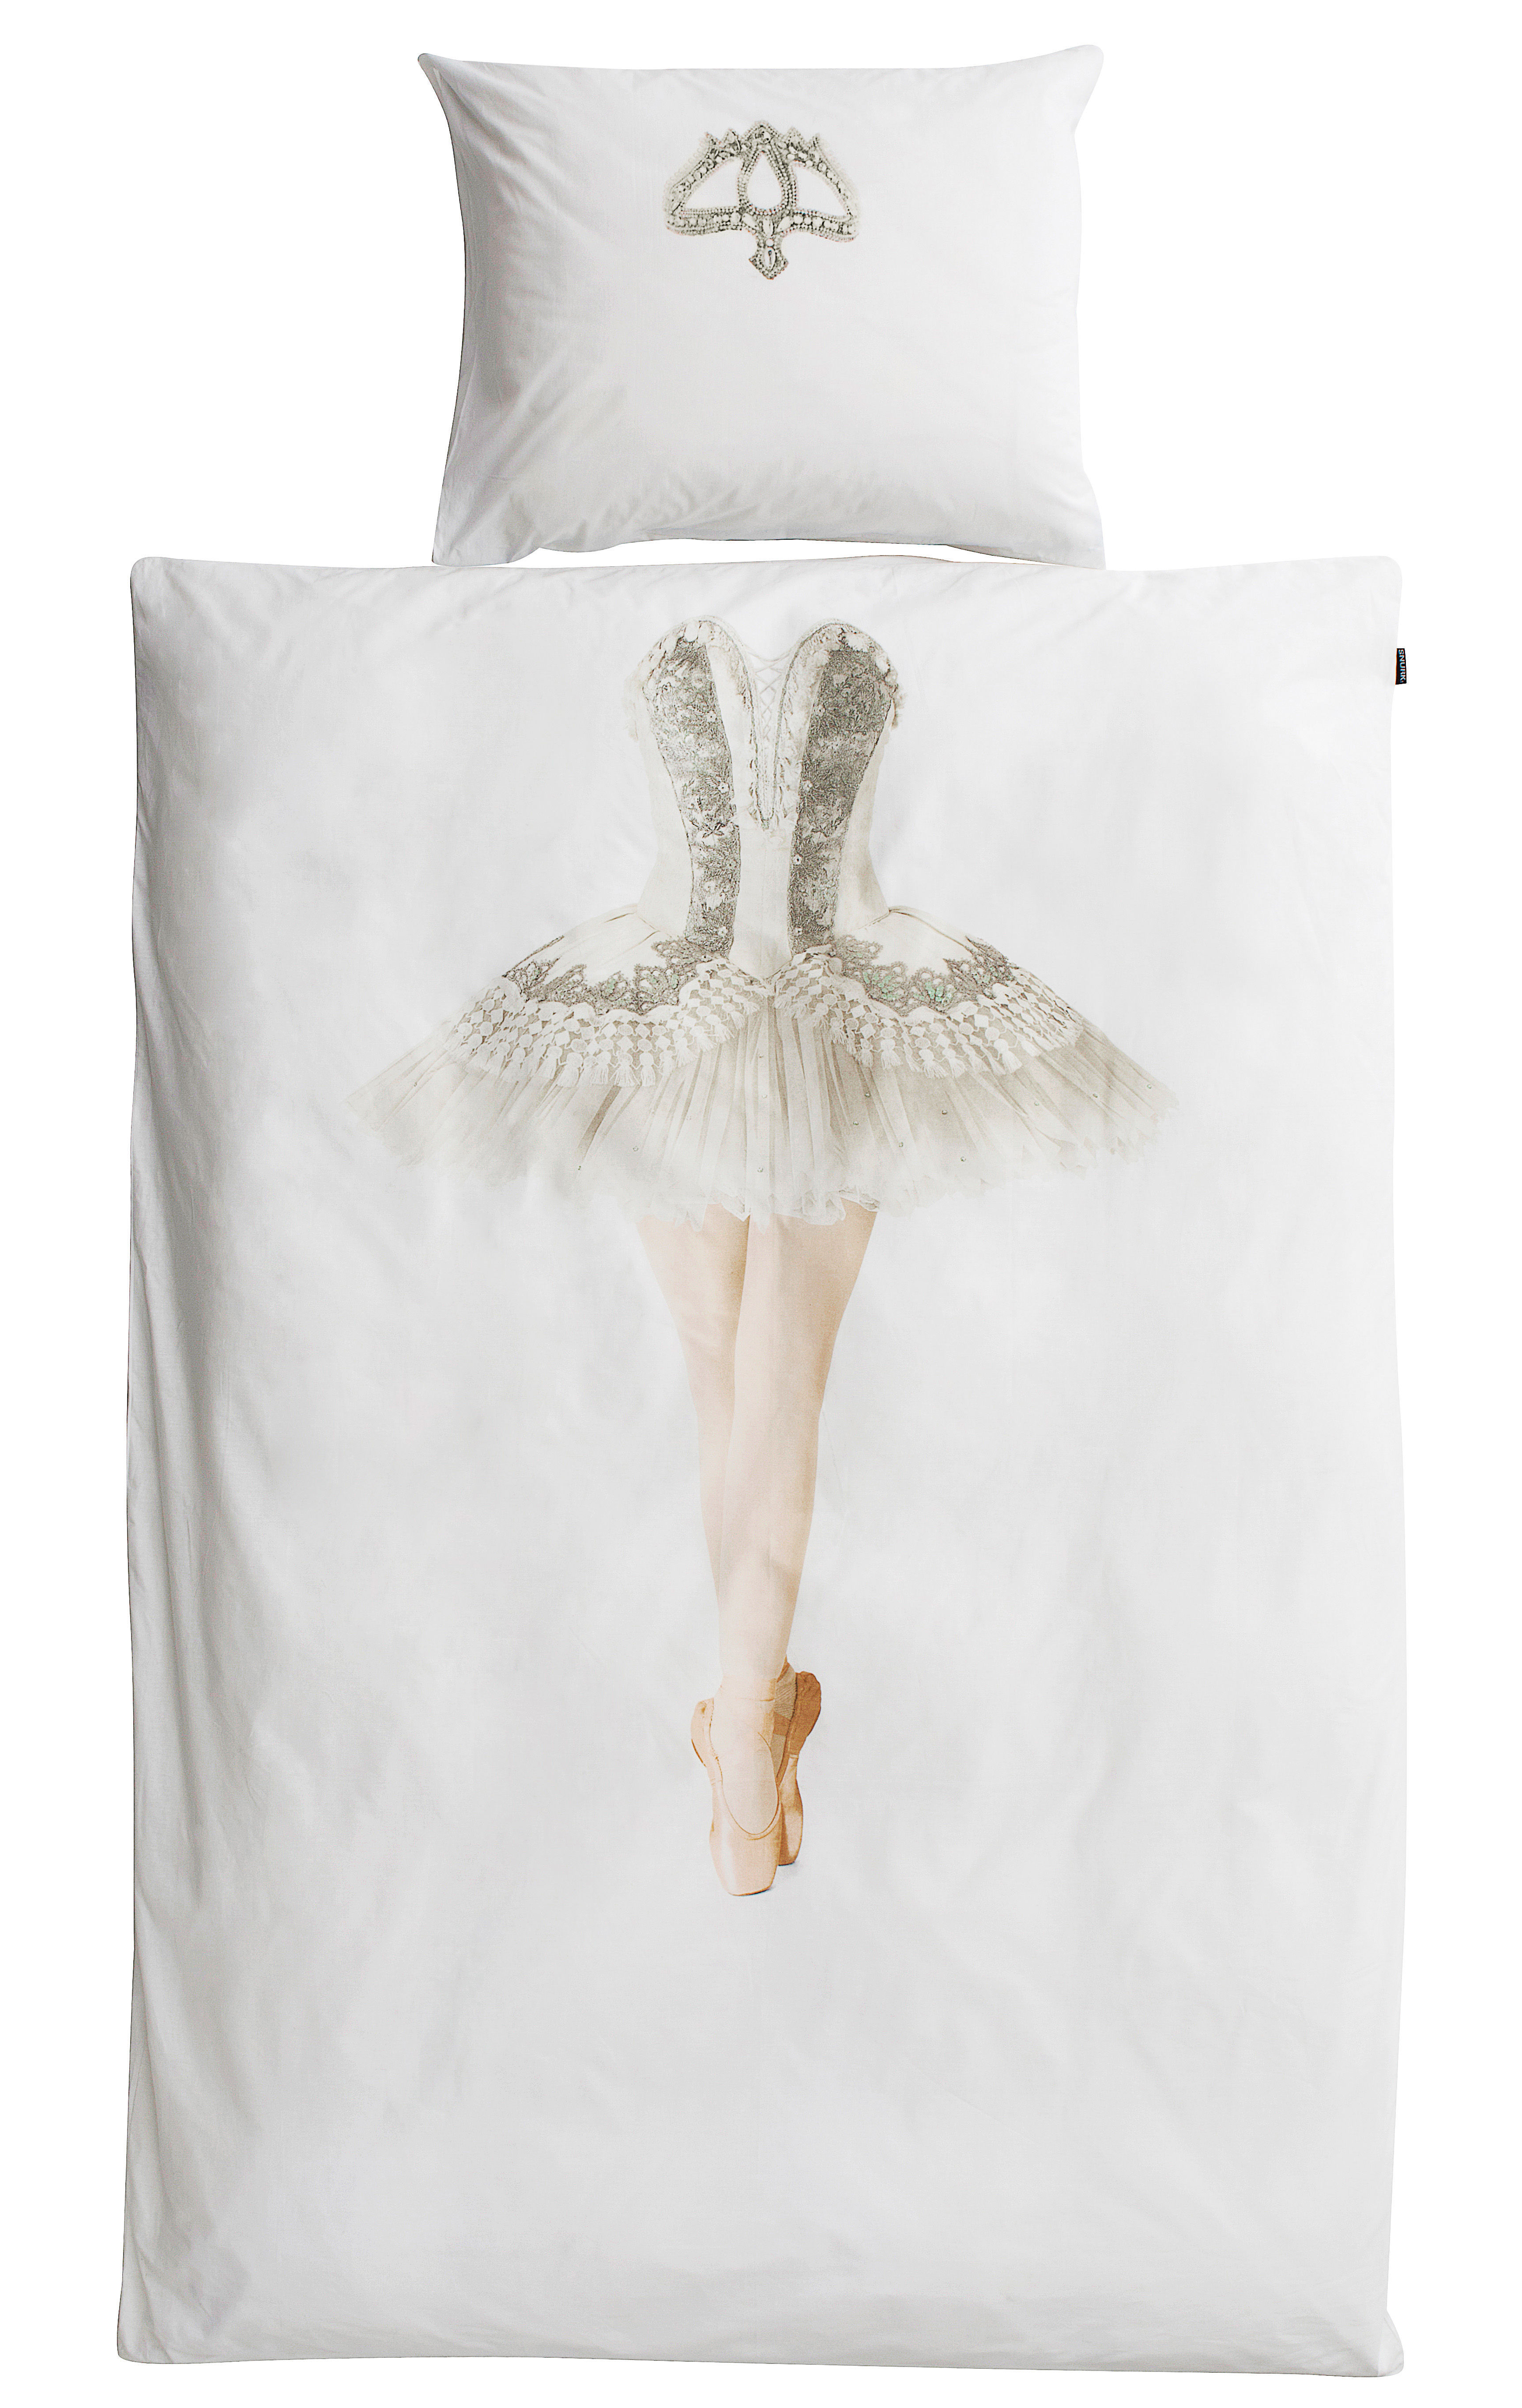 Decoration - Bedding & Bath Towels - Ballerina Bedlinen set for 1 person - 135 x 200 cm by Snurk - Ballerina - Cotton percale